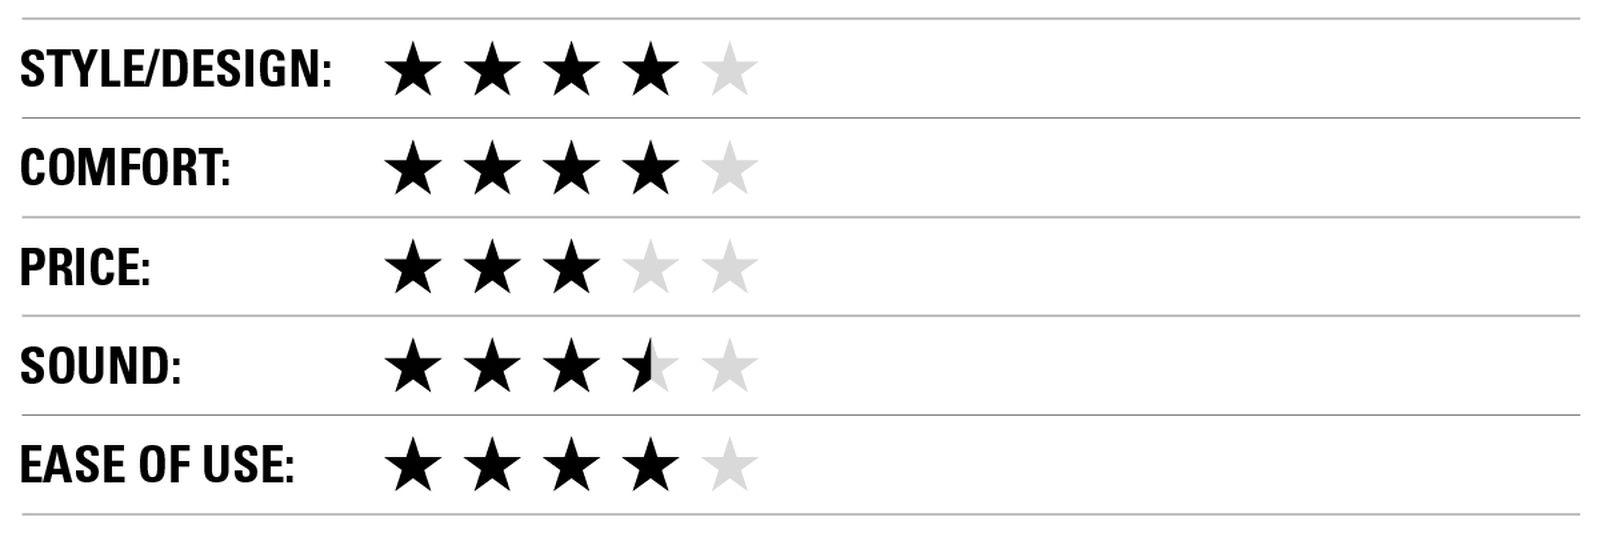 ED_SEL_Headphone rating graphic - stars-01